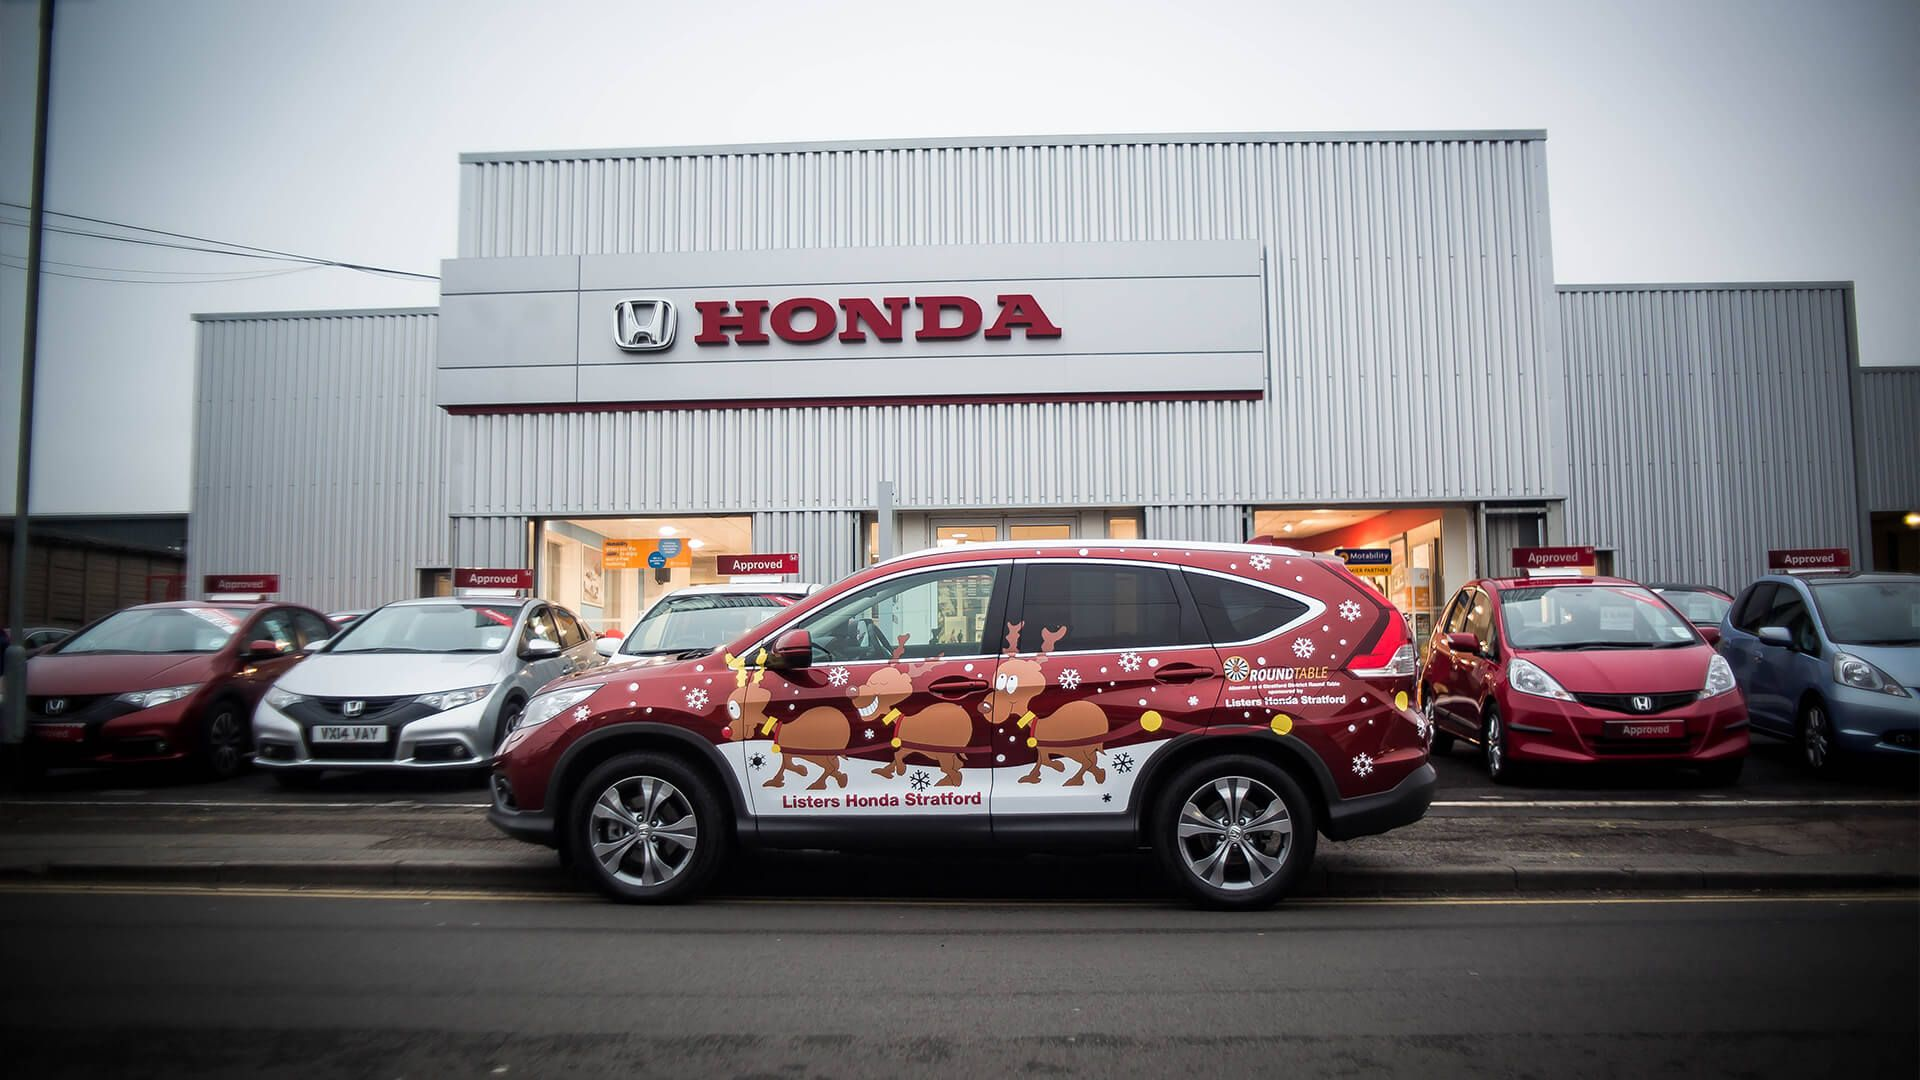 Best Honda Dealers In California Washington Illinois New Jersey And Maryland Honda Toyota Dealers Toyota Dealership